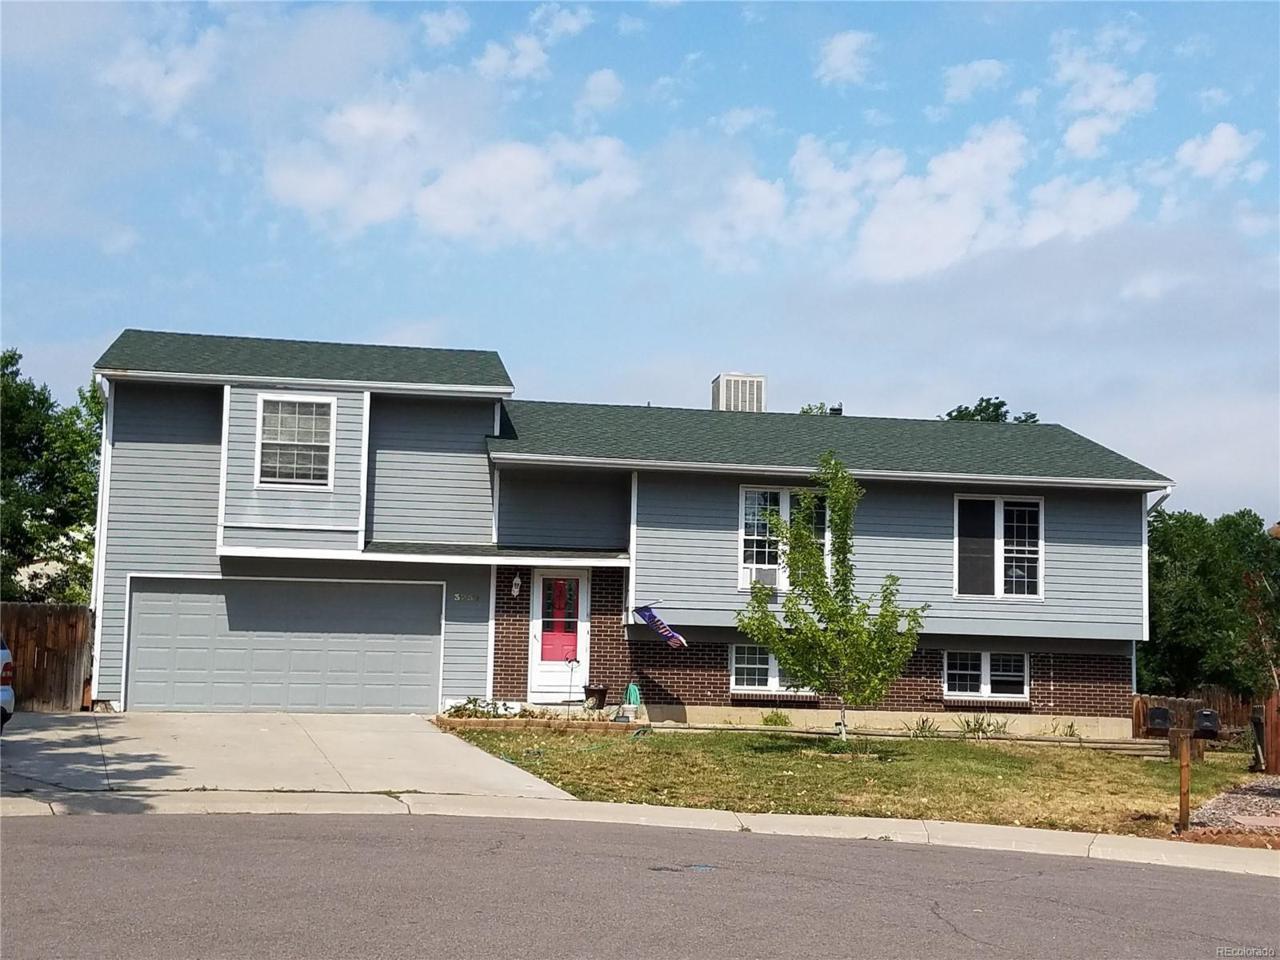 3257 S Dudley Street, Lakewood, CO 80227 (MLS #1868639) :: 8z Real Estate